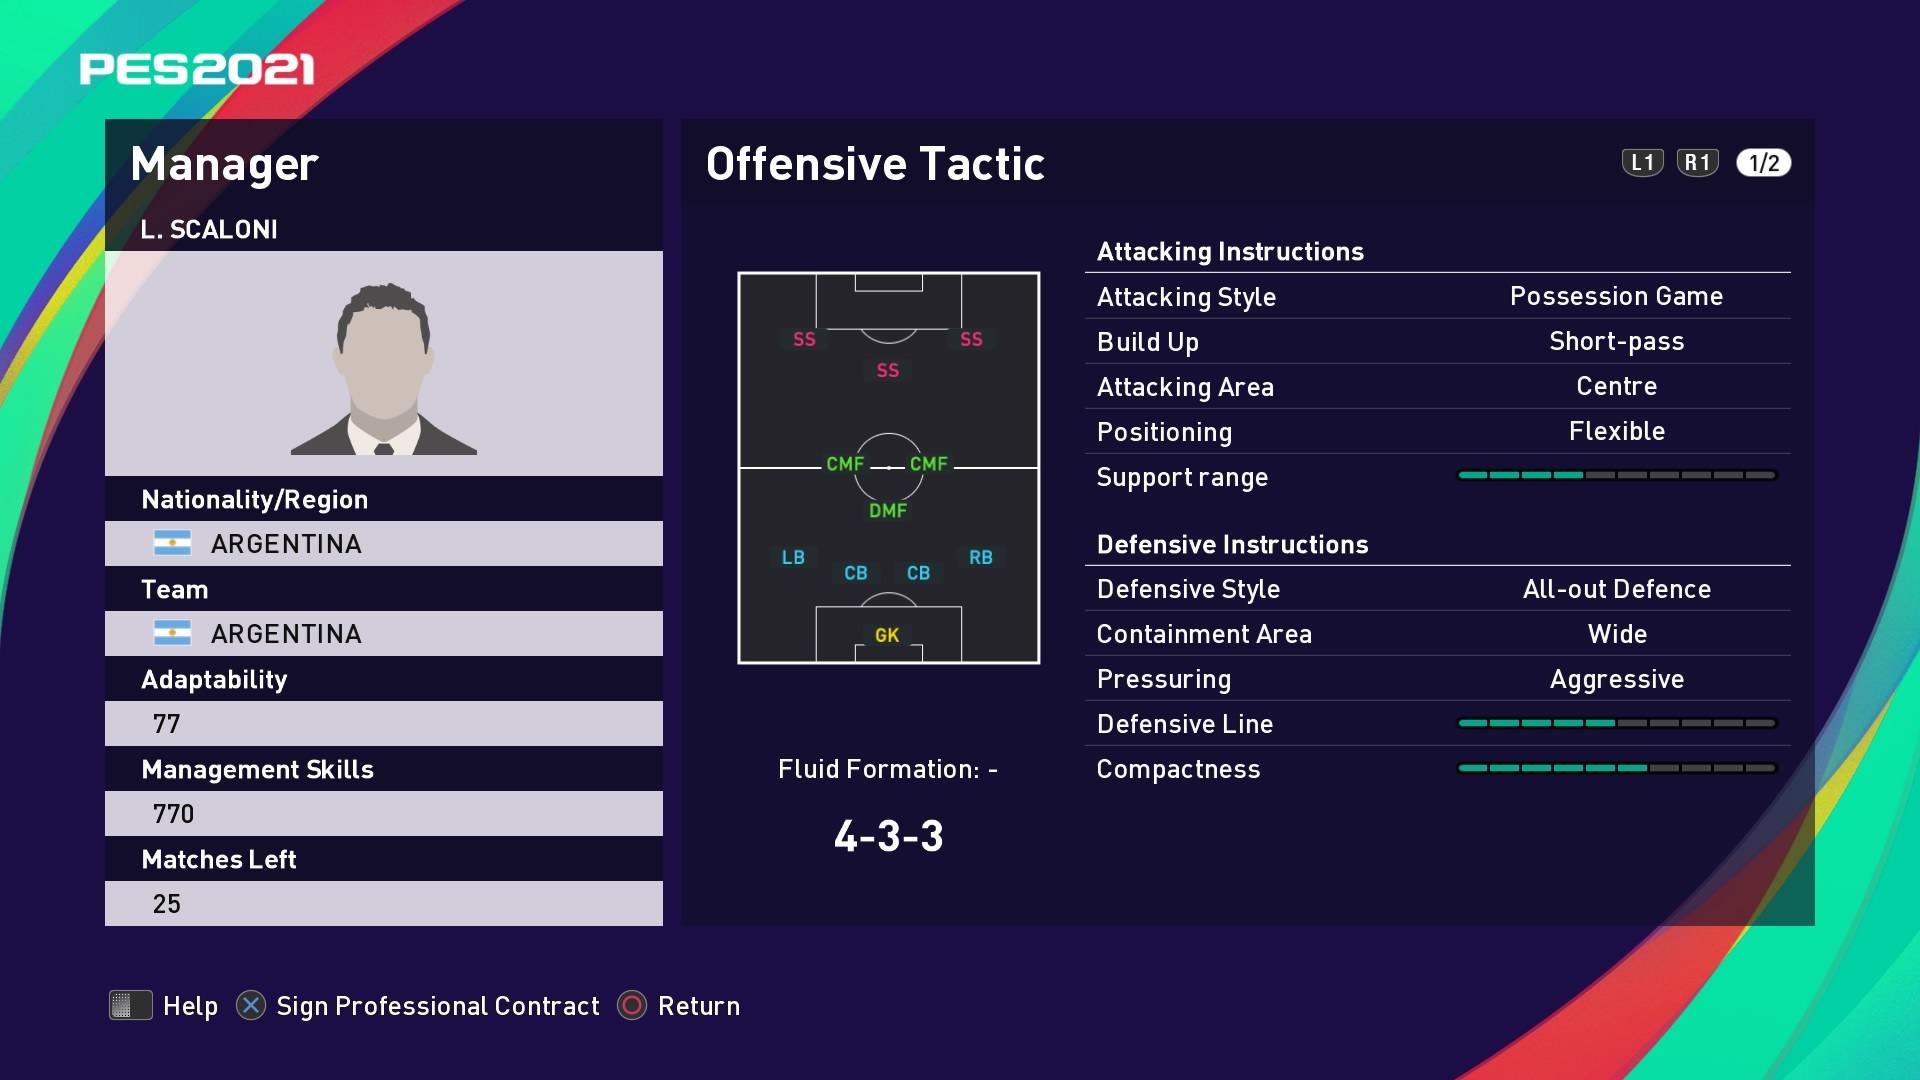 L. Scaloni (Lionel Scaloni) Offensive Tactic in PES 2021 myClub